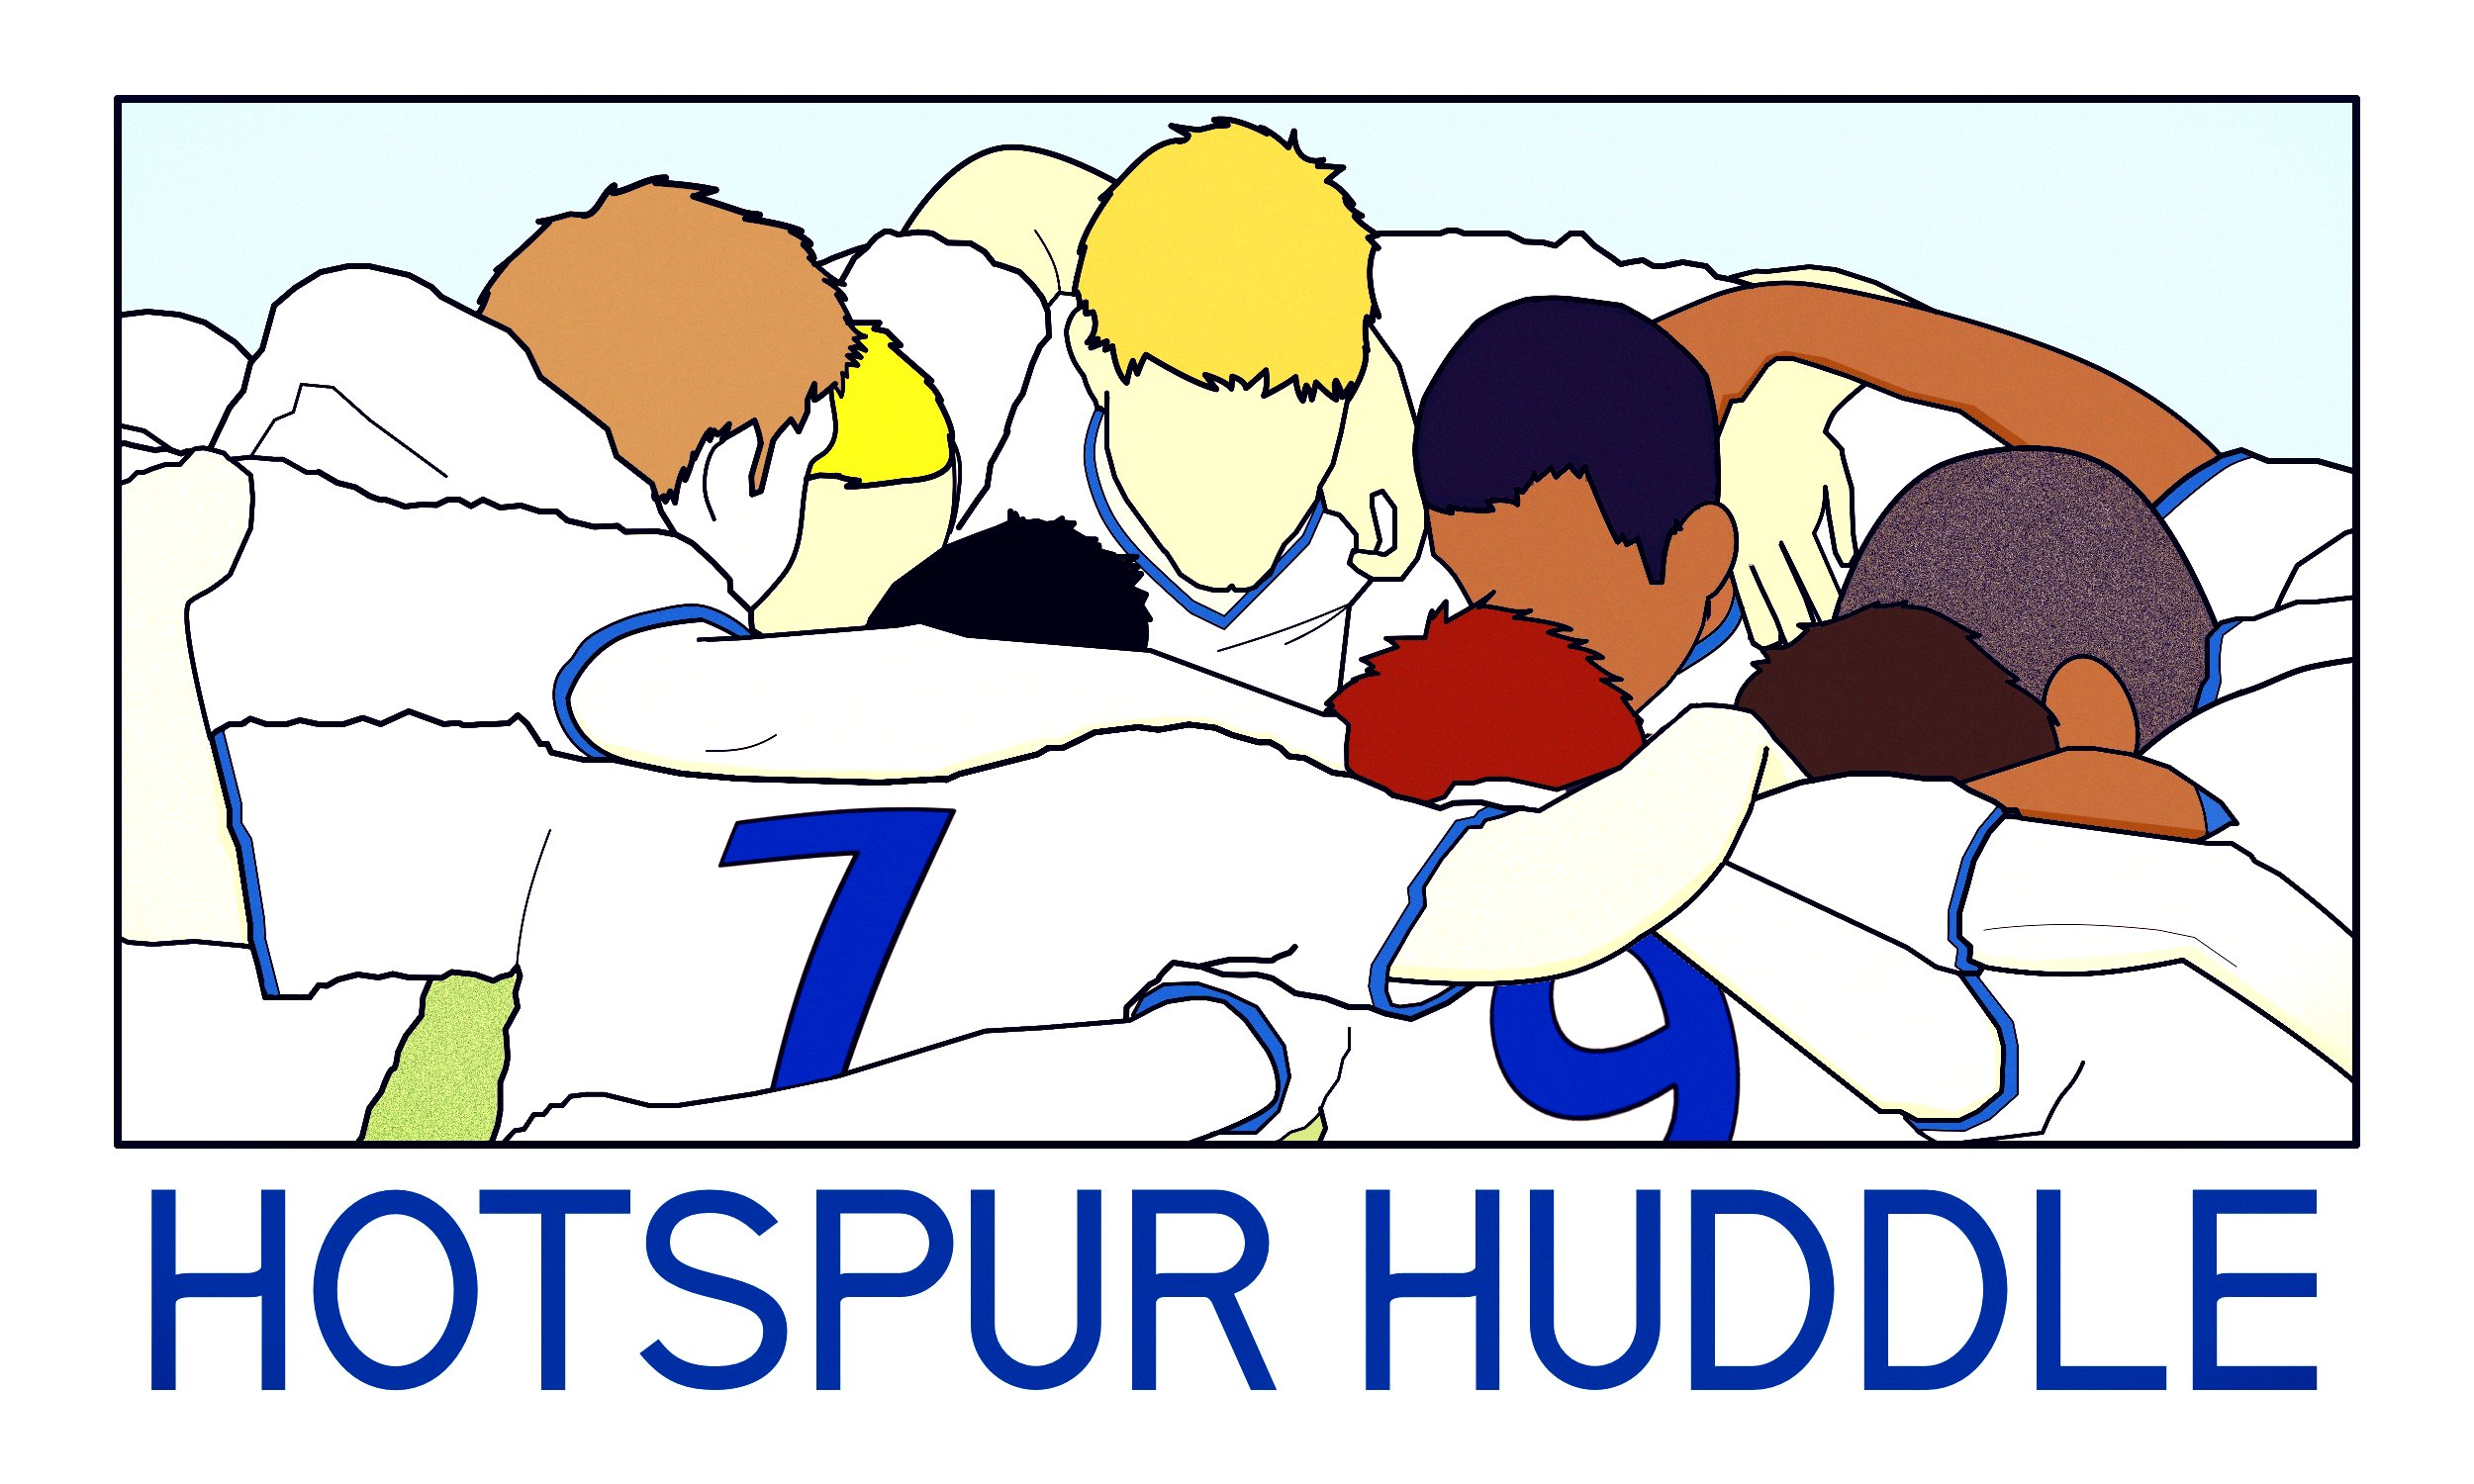 Hotspur Huddle LWIMTH.jpg